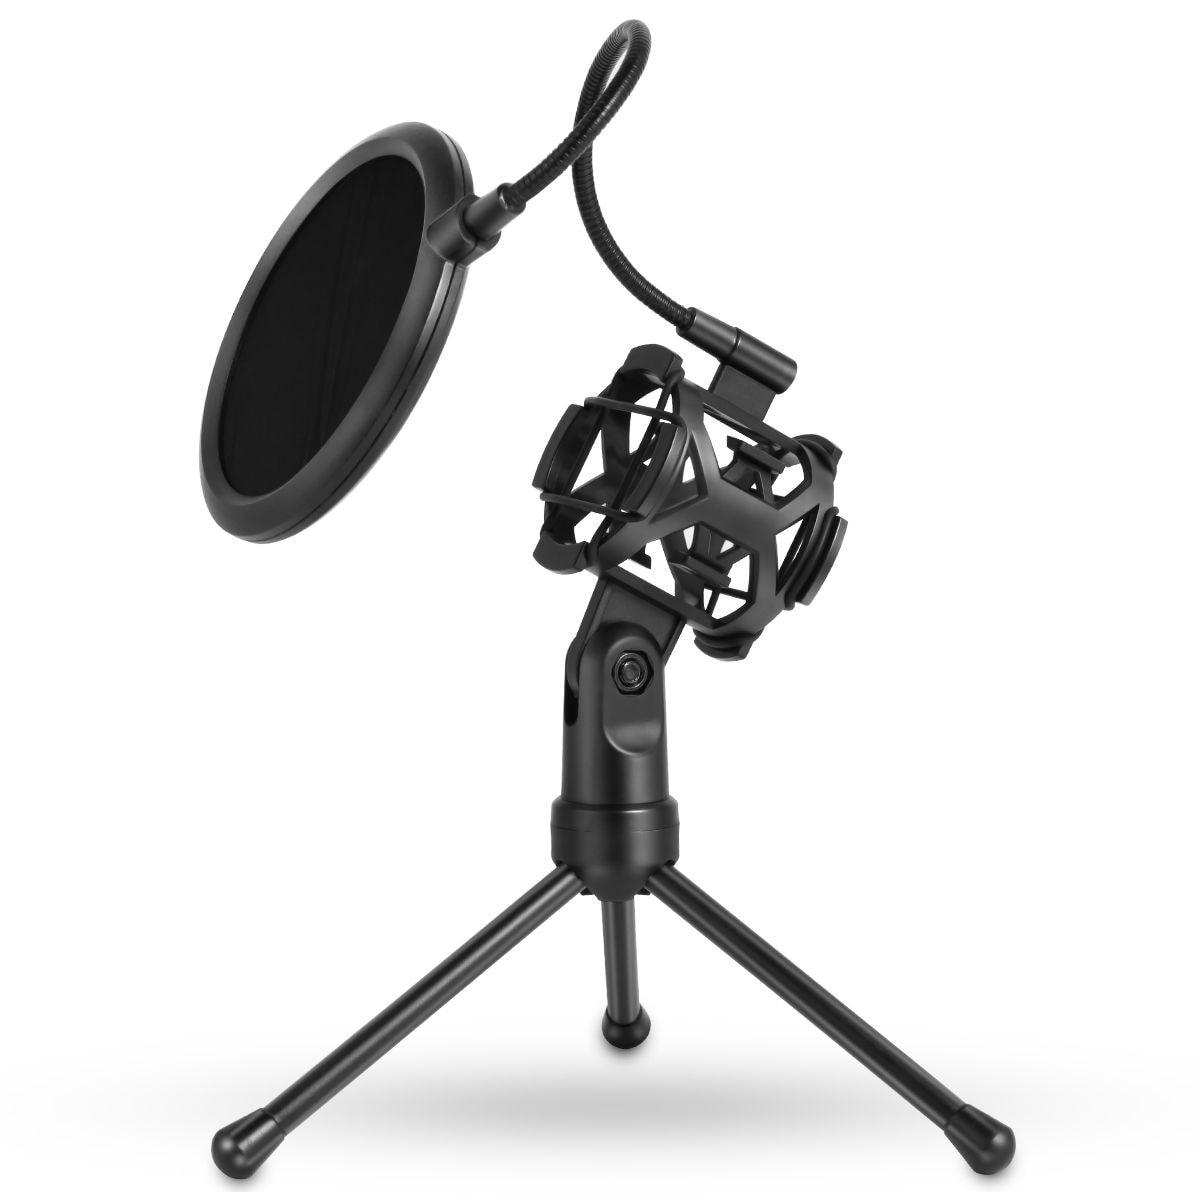 Unterhaltungselektronik Beliebte Marke Tragbare Mikrofon Desktop-stativ Aufnahme Mikrofon Stehen Mit Mikrofon Clip Windschutz Filter